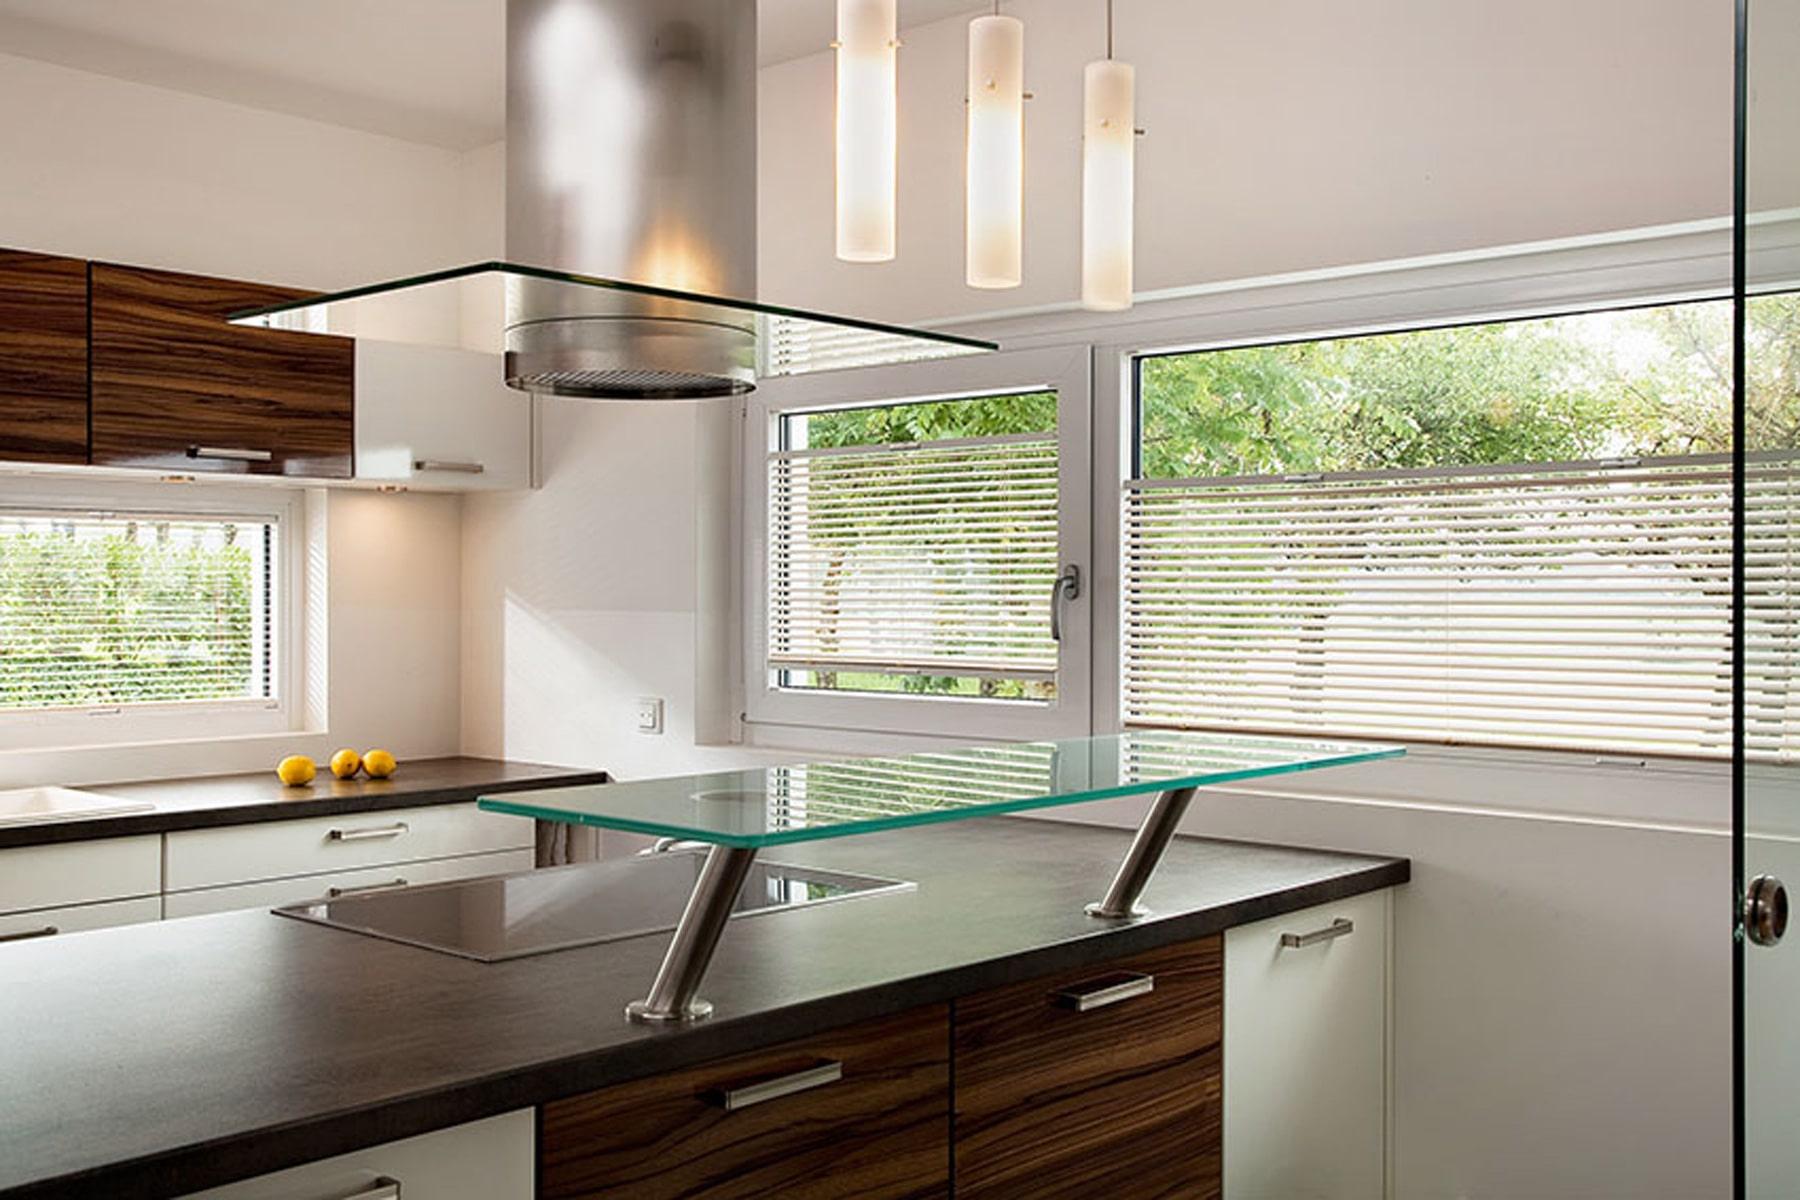 best alternative zu vorh ngen gallery. Black Bedroom Furniture Sets. Home Design Ideas